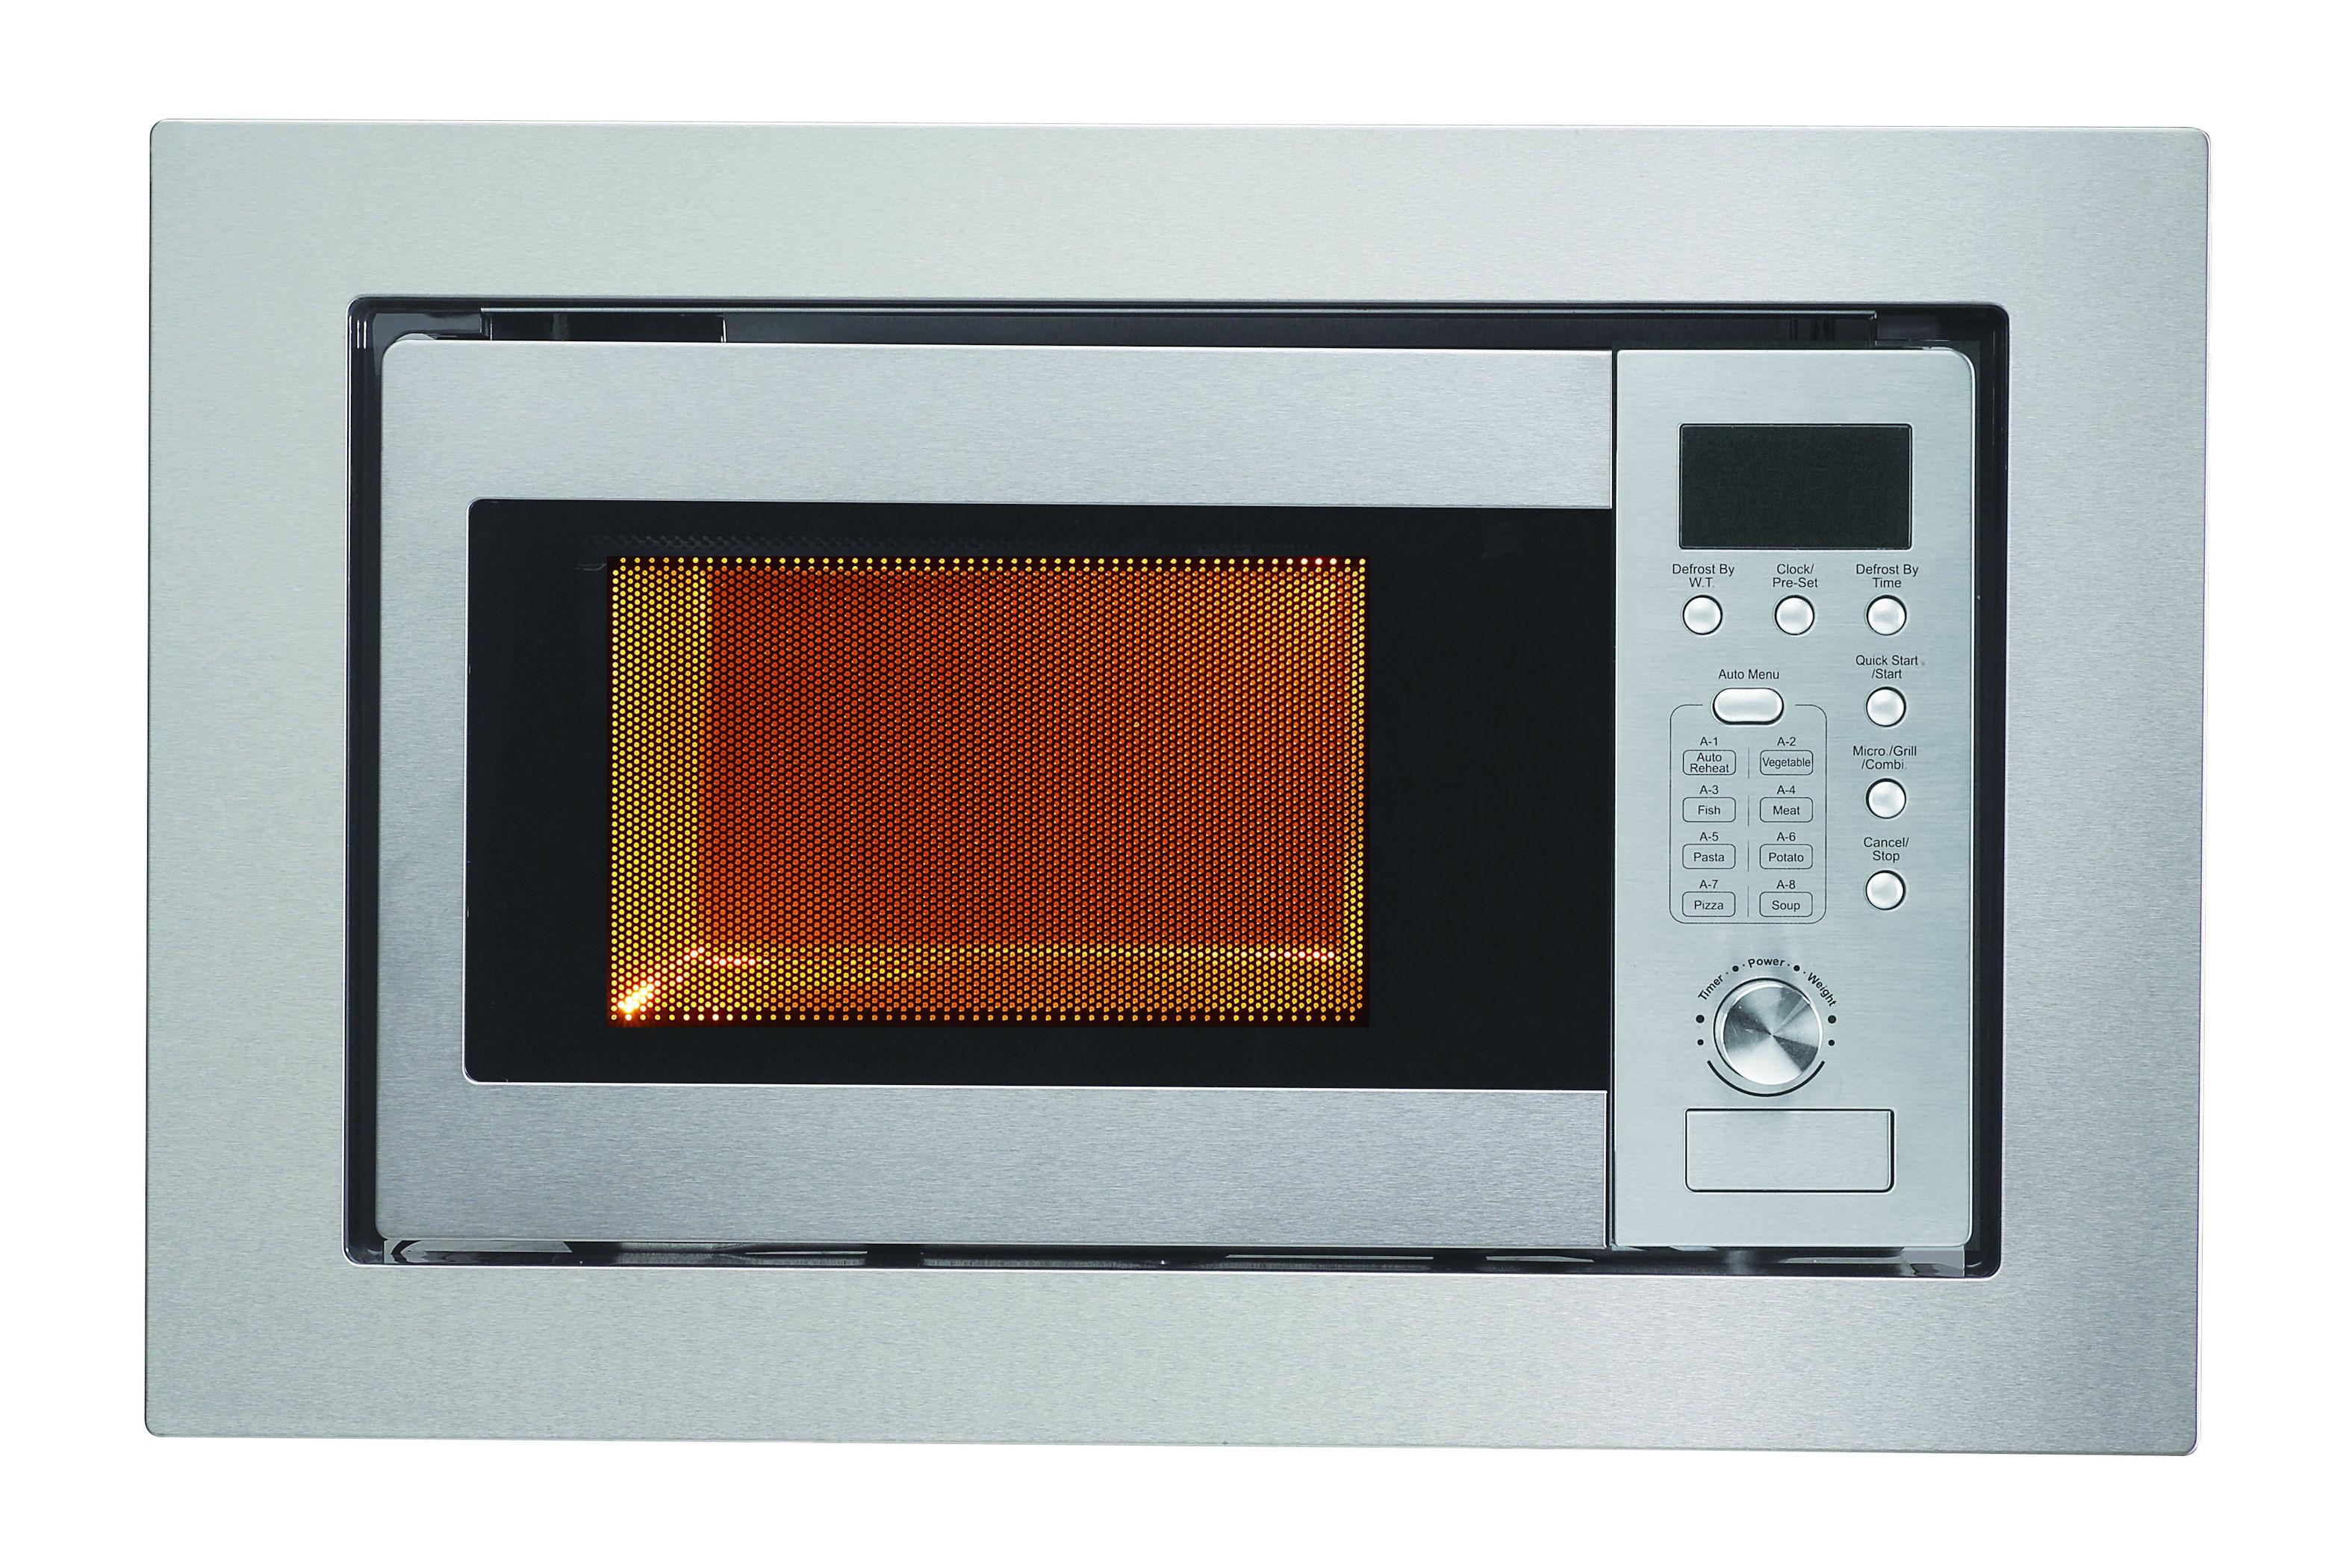 Uncategorized. Integrated Kitchen Appliances Uk. jamesmcavoybr Home ...